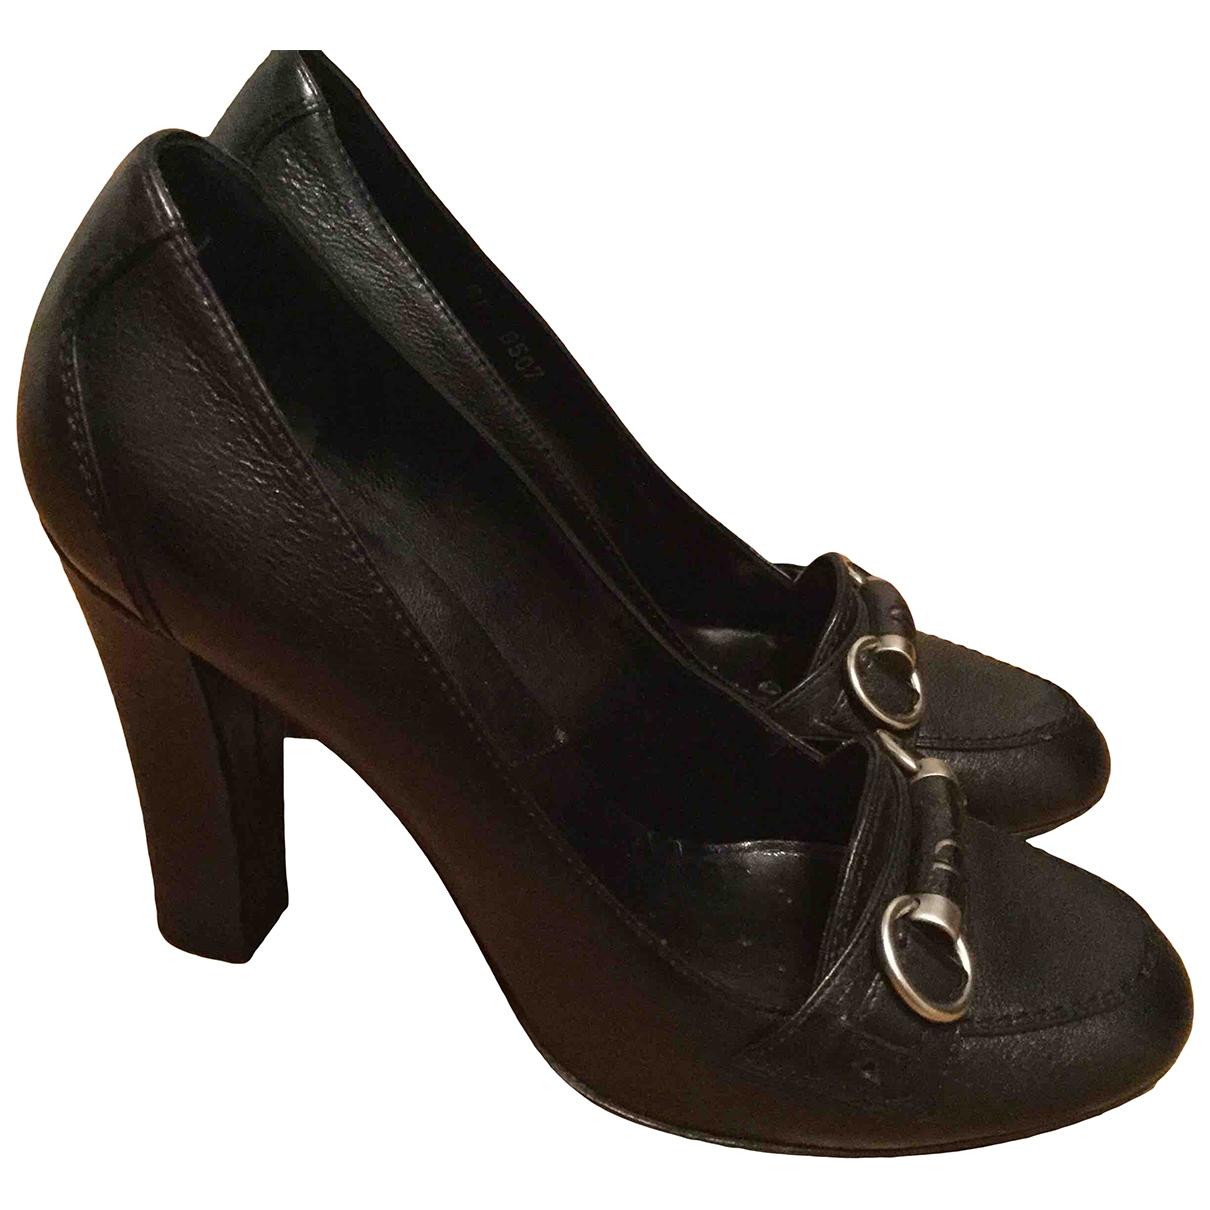 Dior \N Black Leather Heels for Women 36 EU